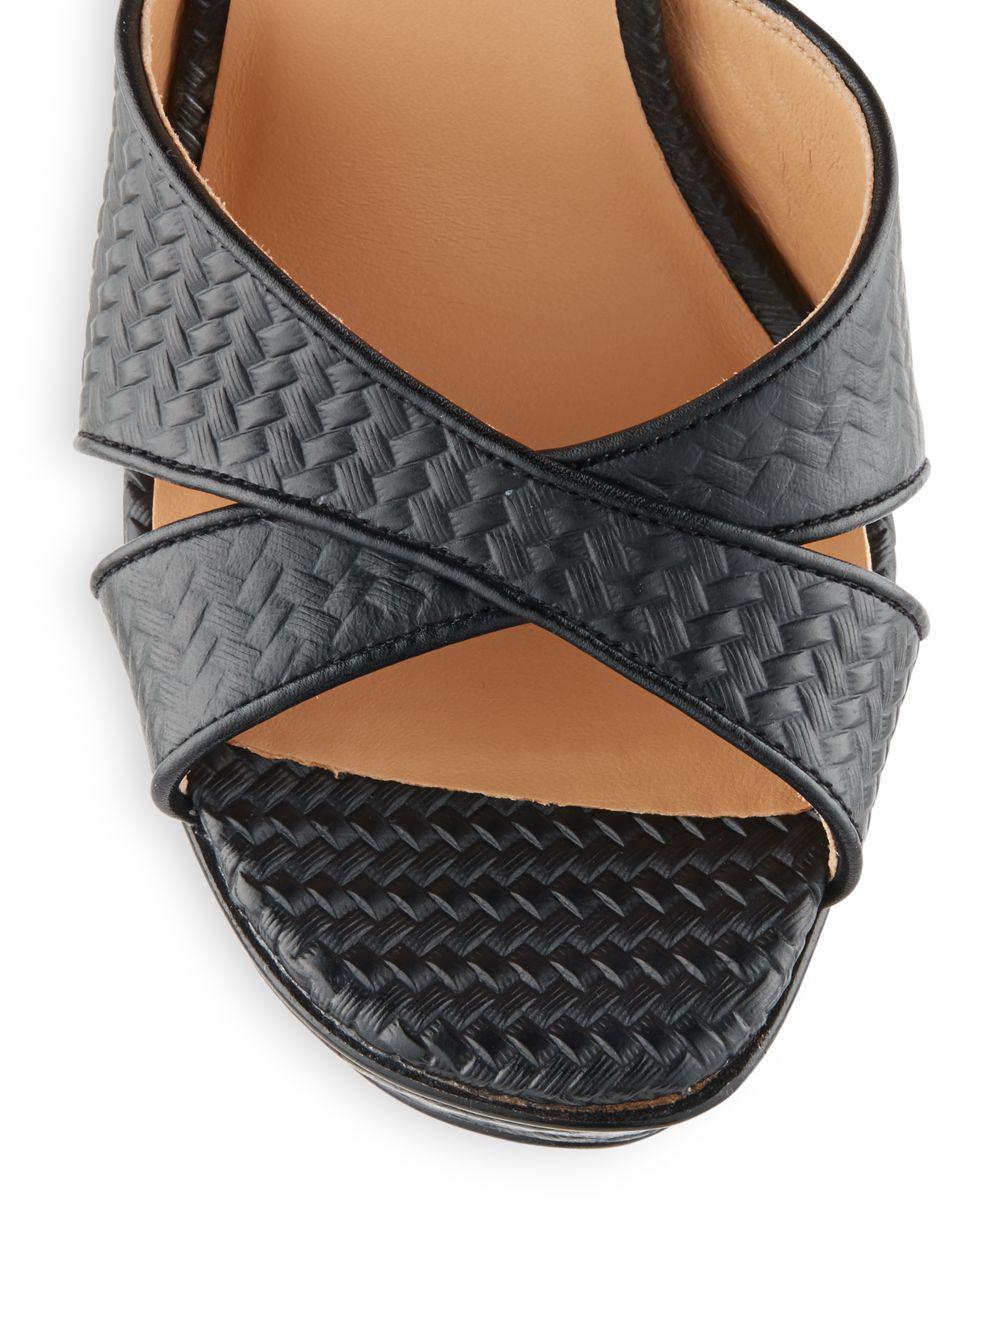 Halston Embossed Leather Platform Sandals In Black Lyst